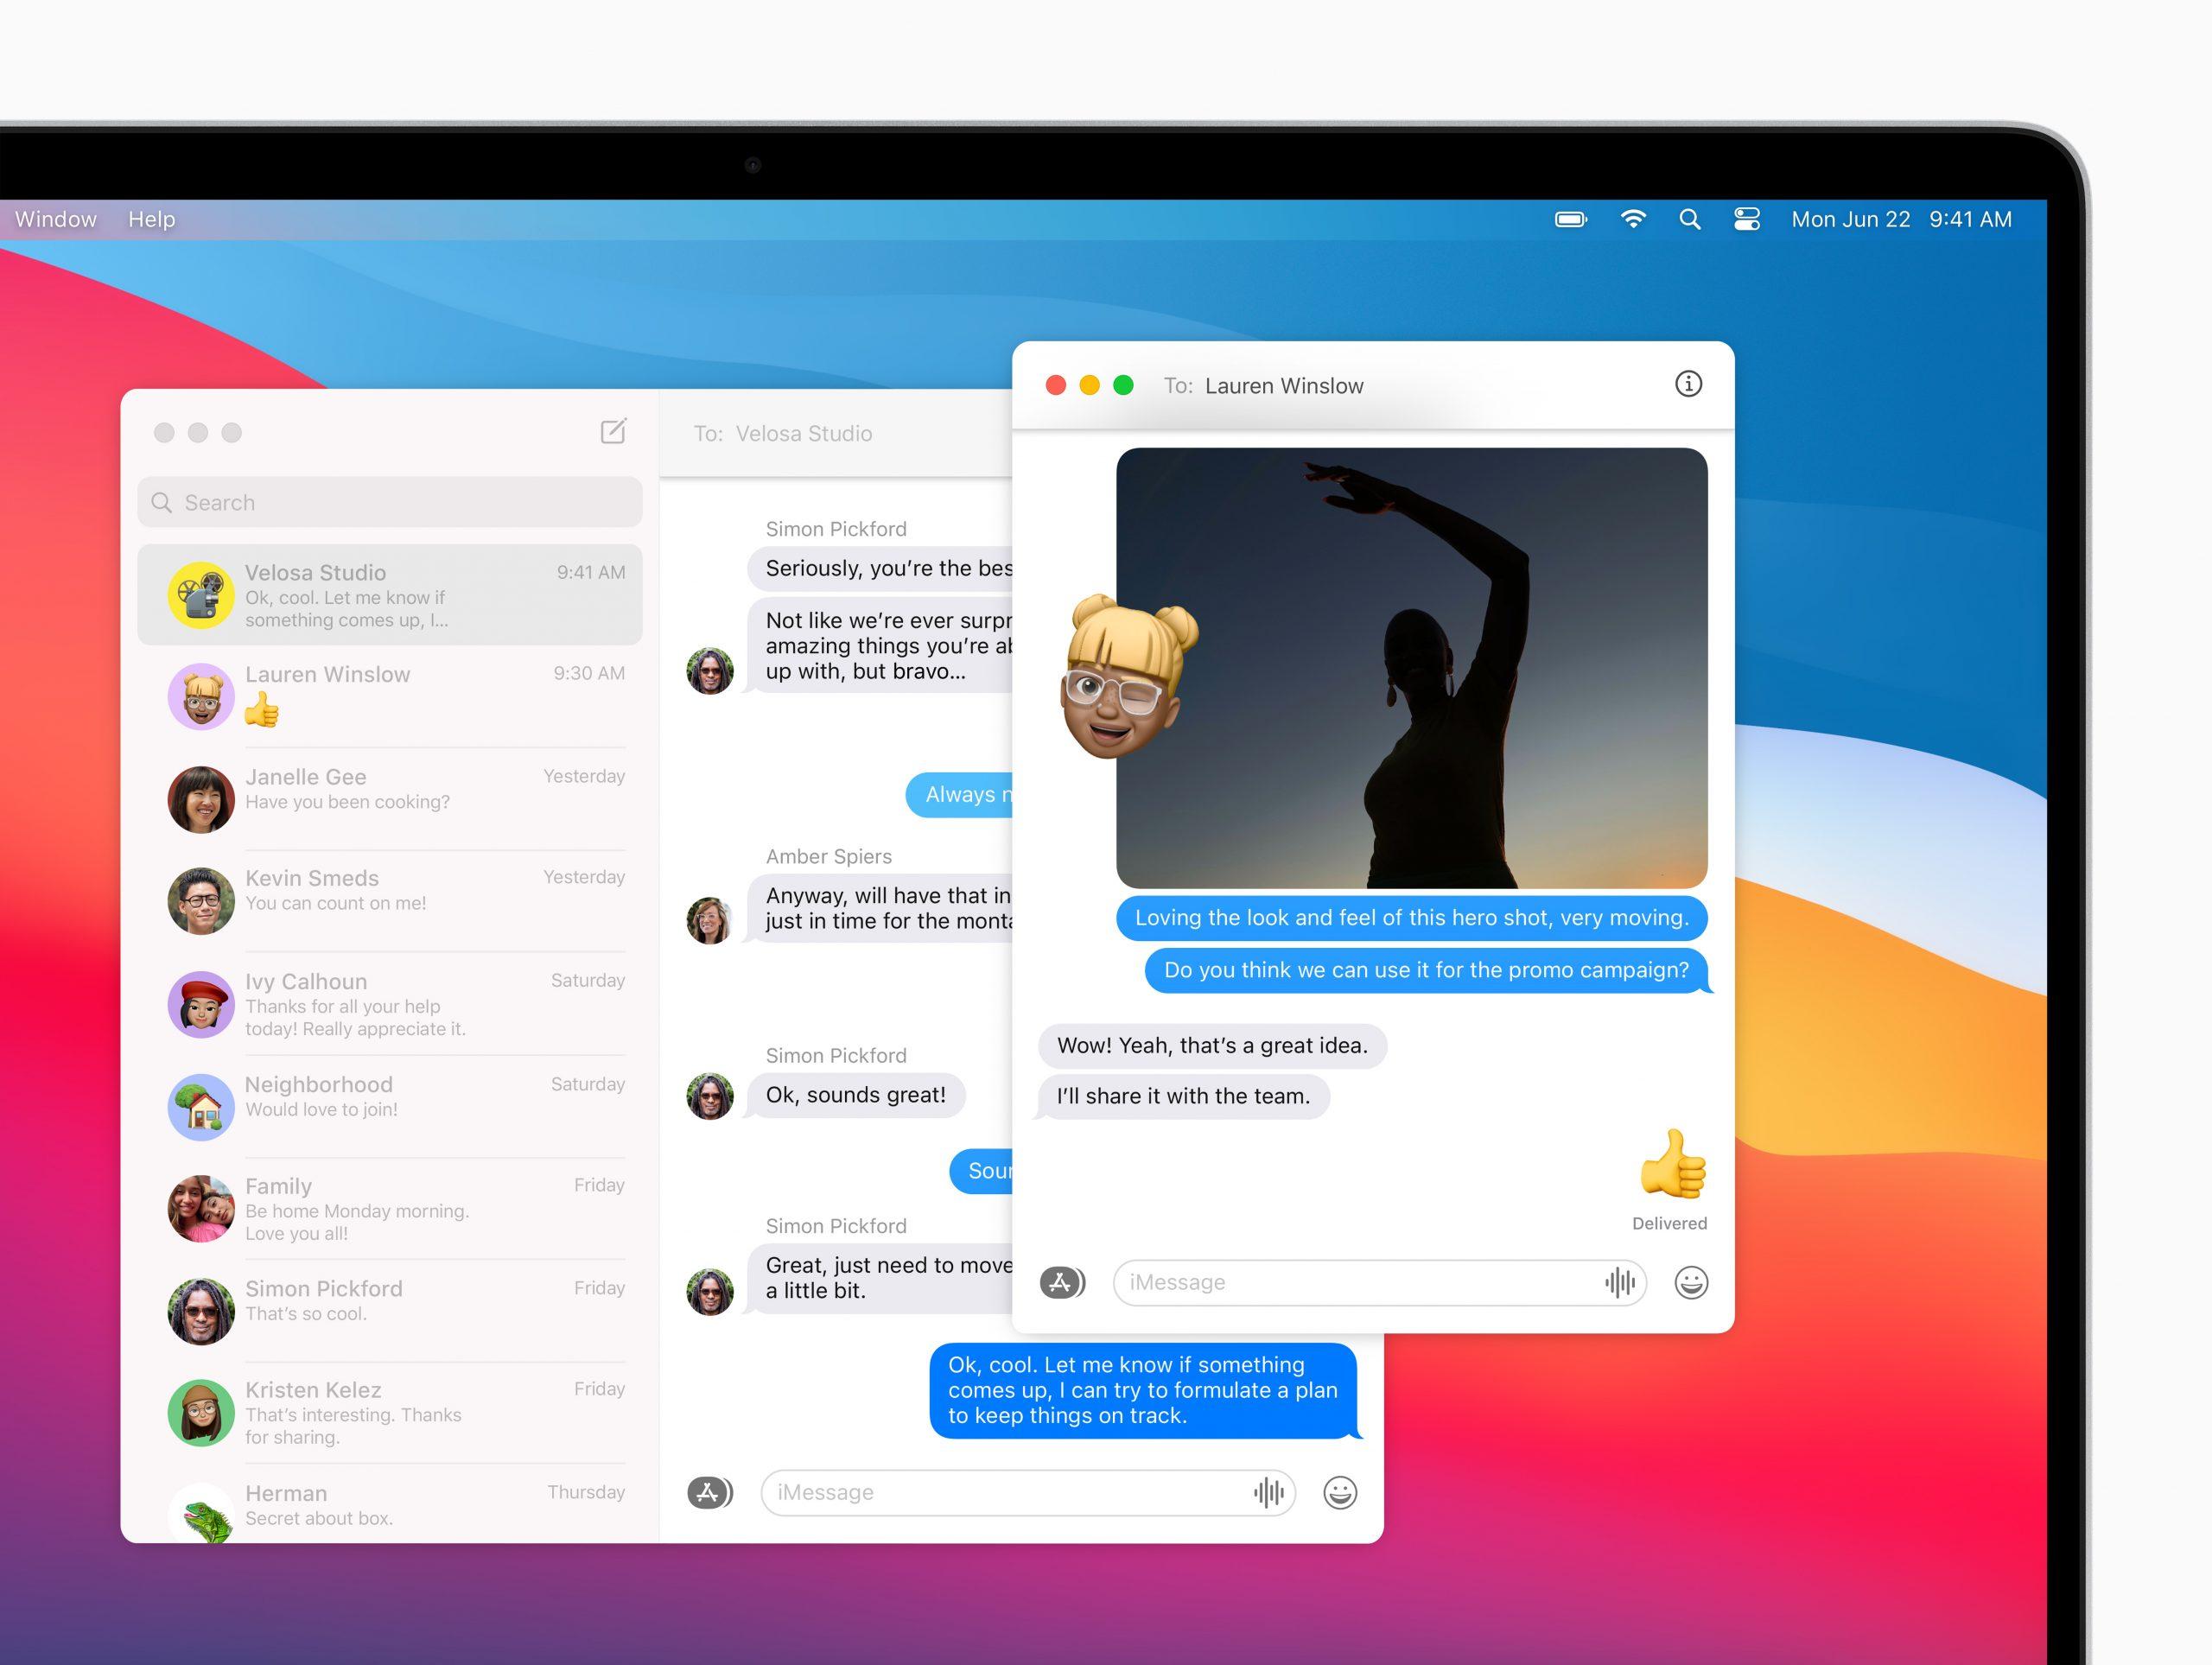 apple_macos-big-sur_messages-memoji